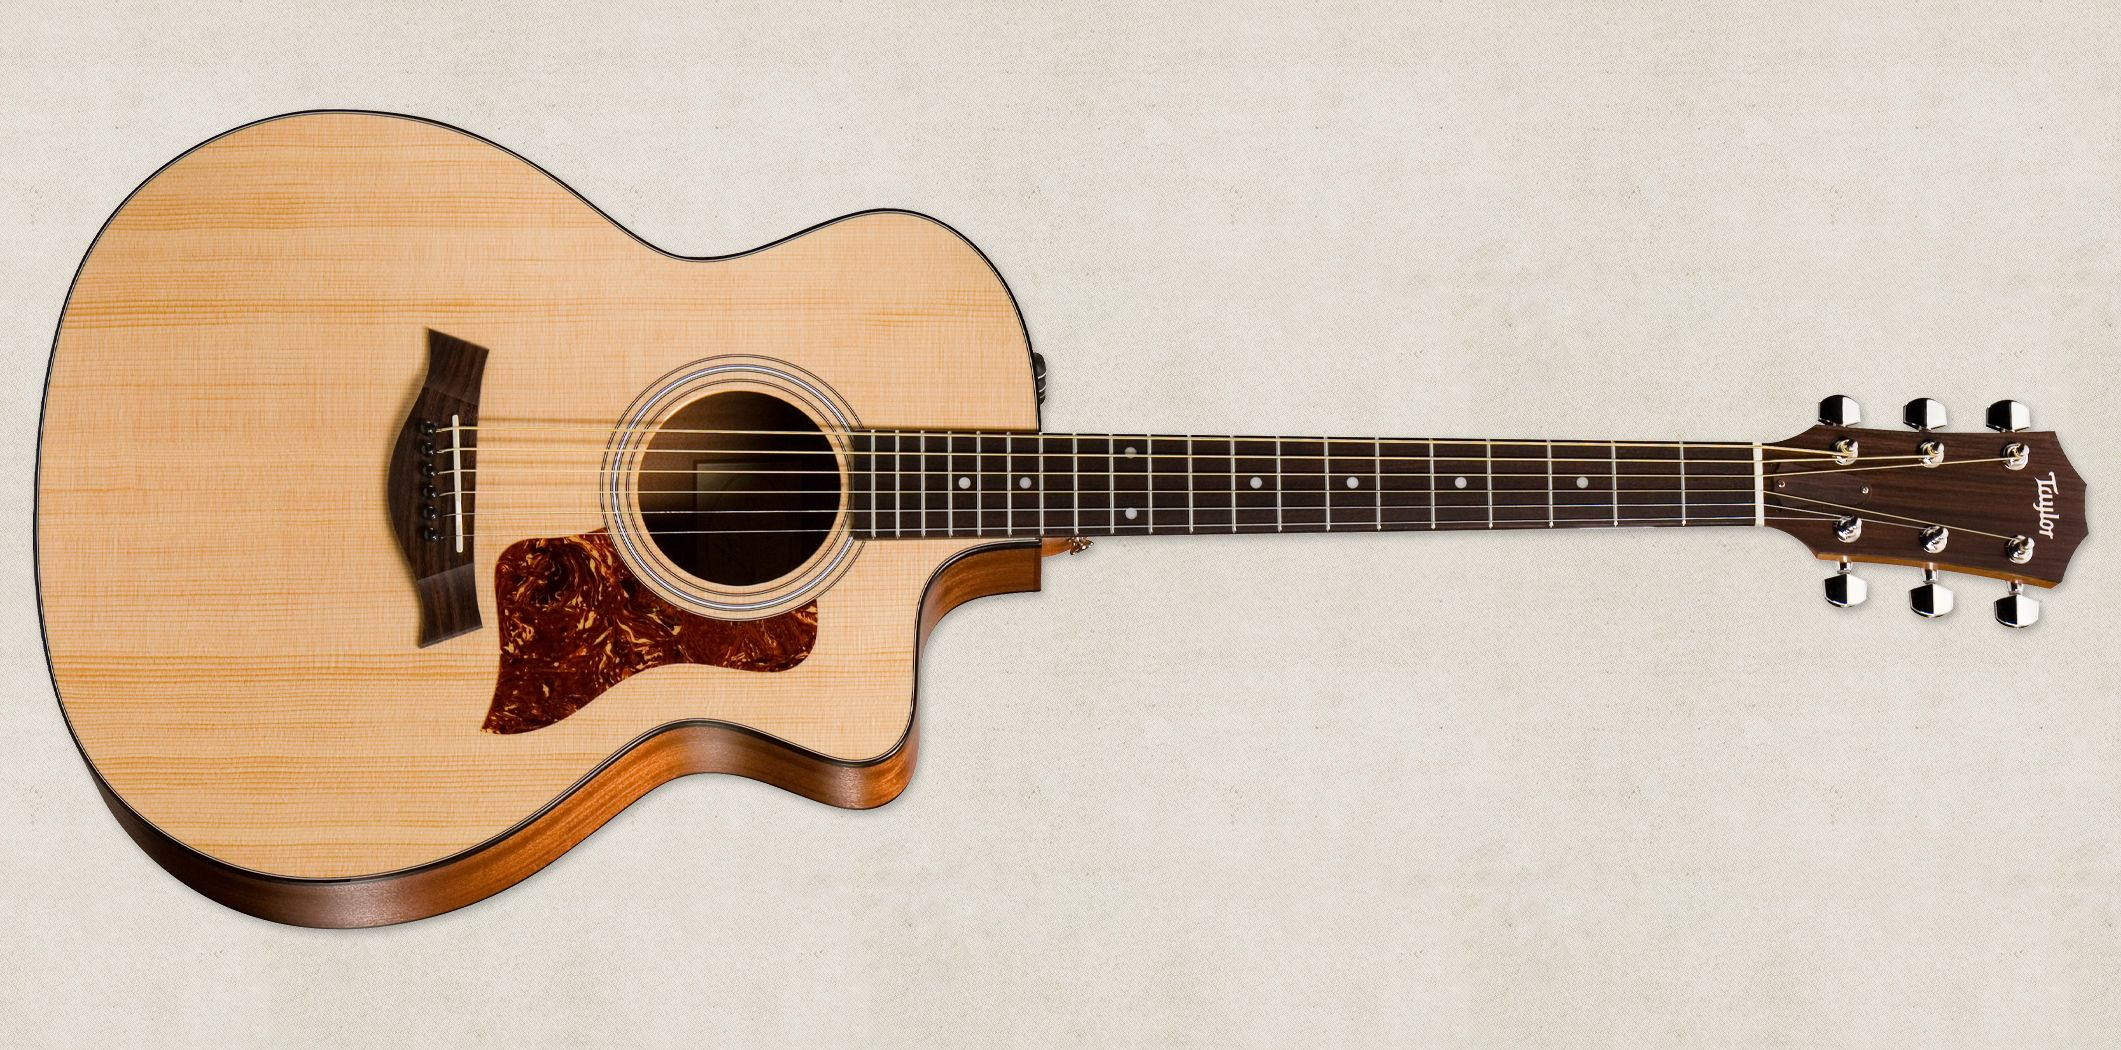 taylor guitars - Google Search   guitar   Pinterest ...